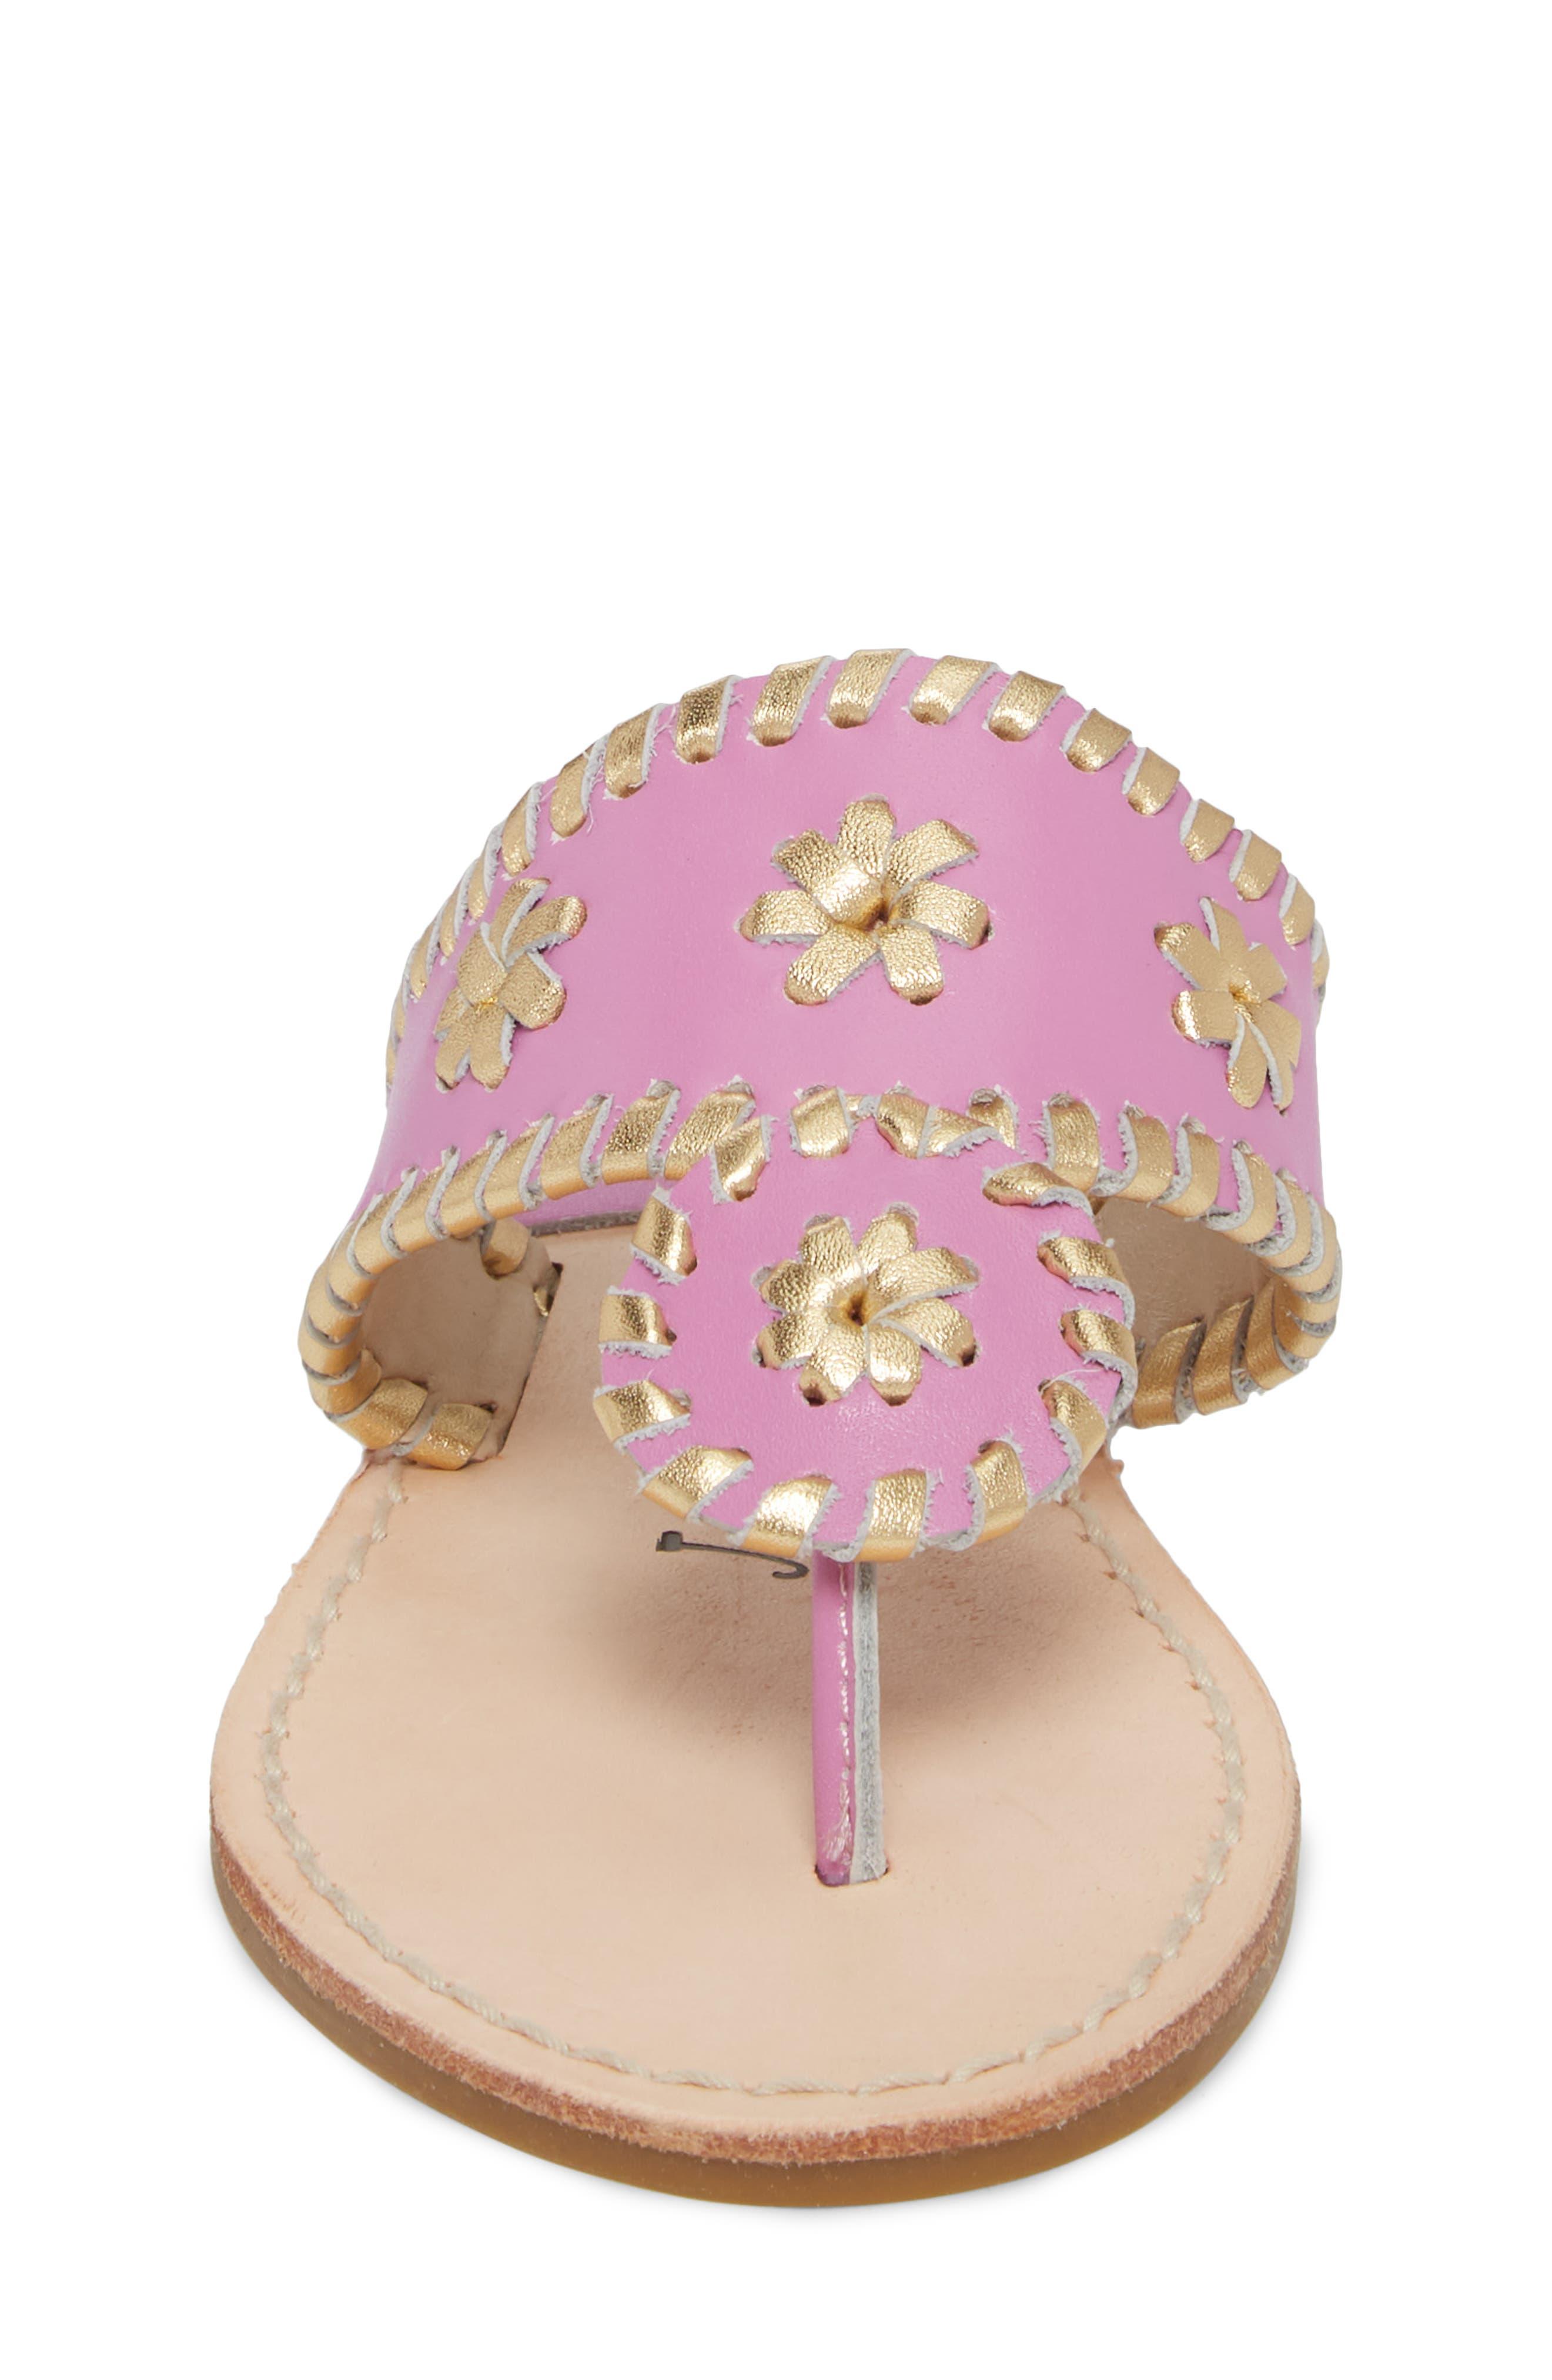 Miss Hollis Metallic Trim Thong Sandal,                             Alternate thumbnail 4, color,                             Lavender Pink/ Gold Leather